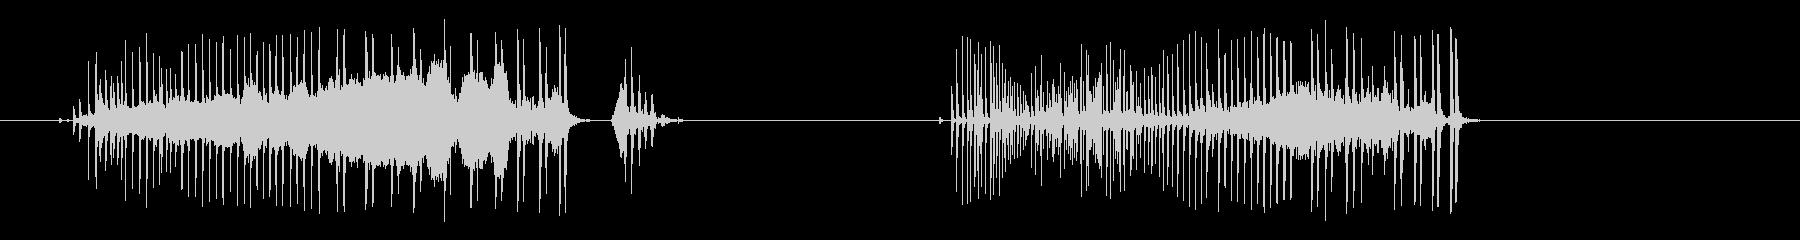 Yell、Stretch&Whiz...の未再生の波形